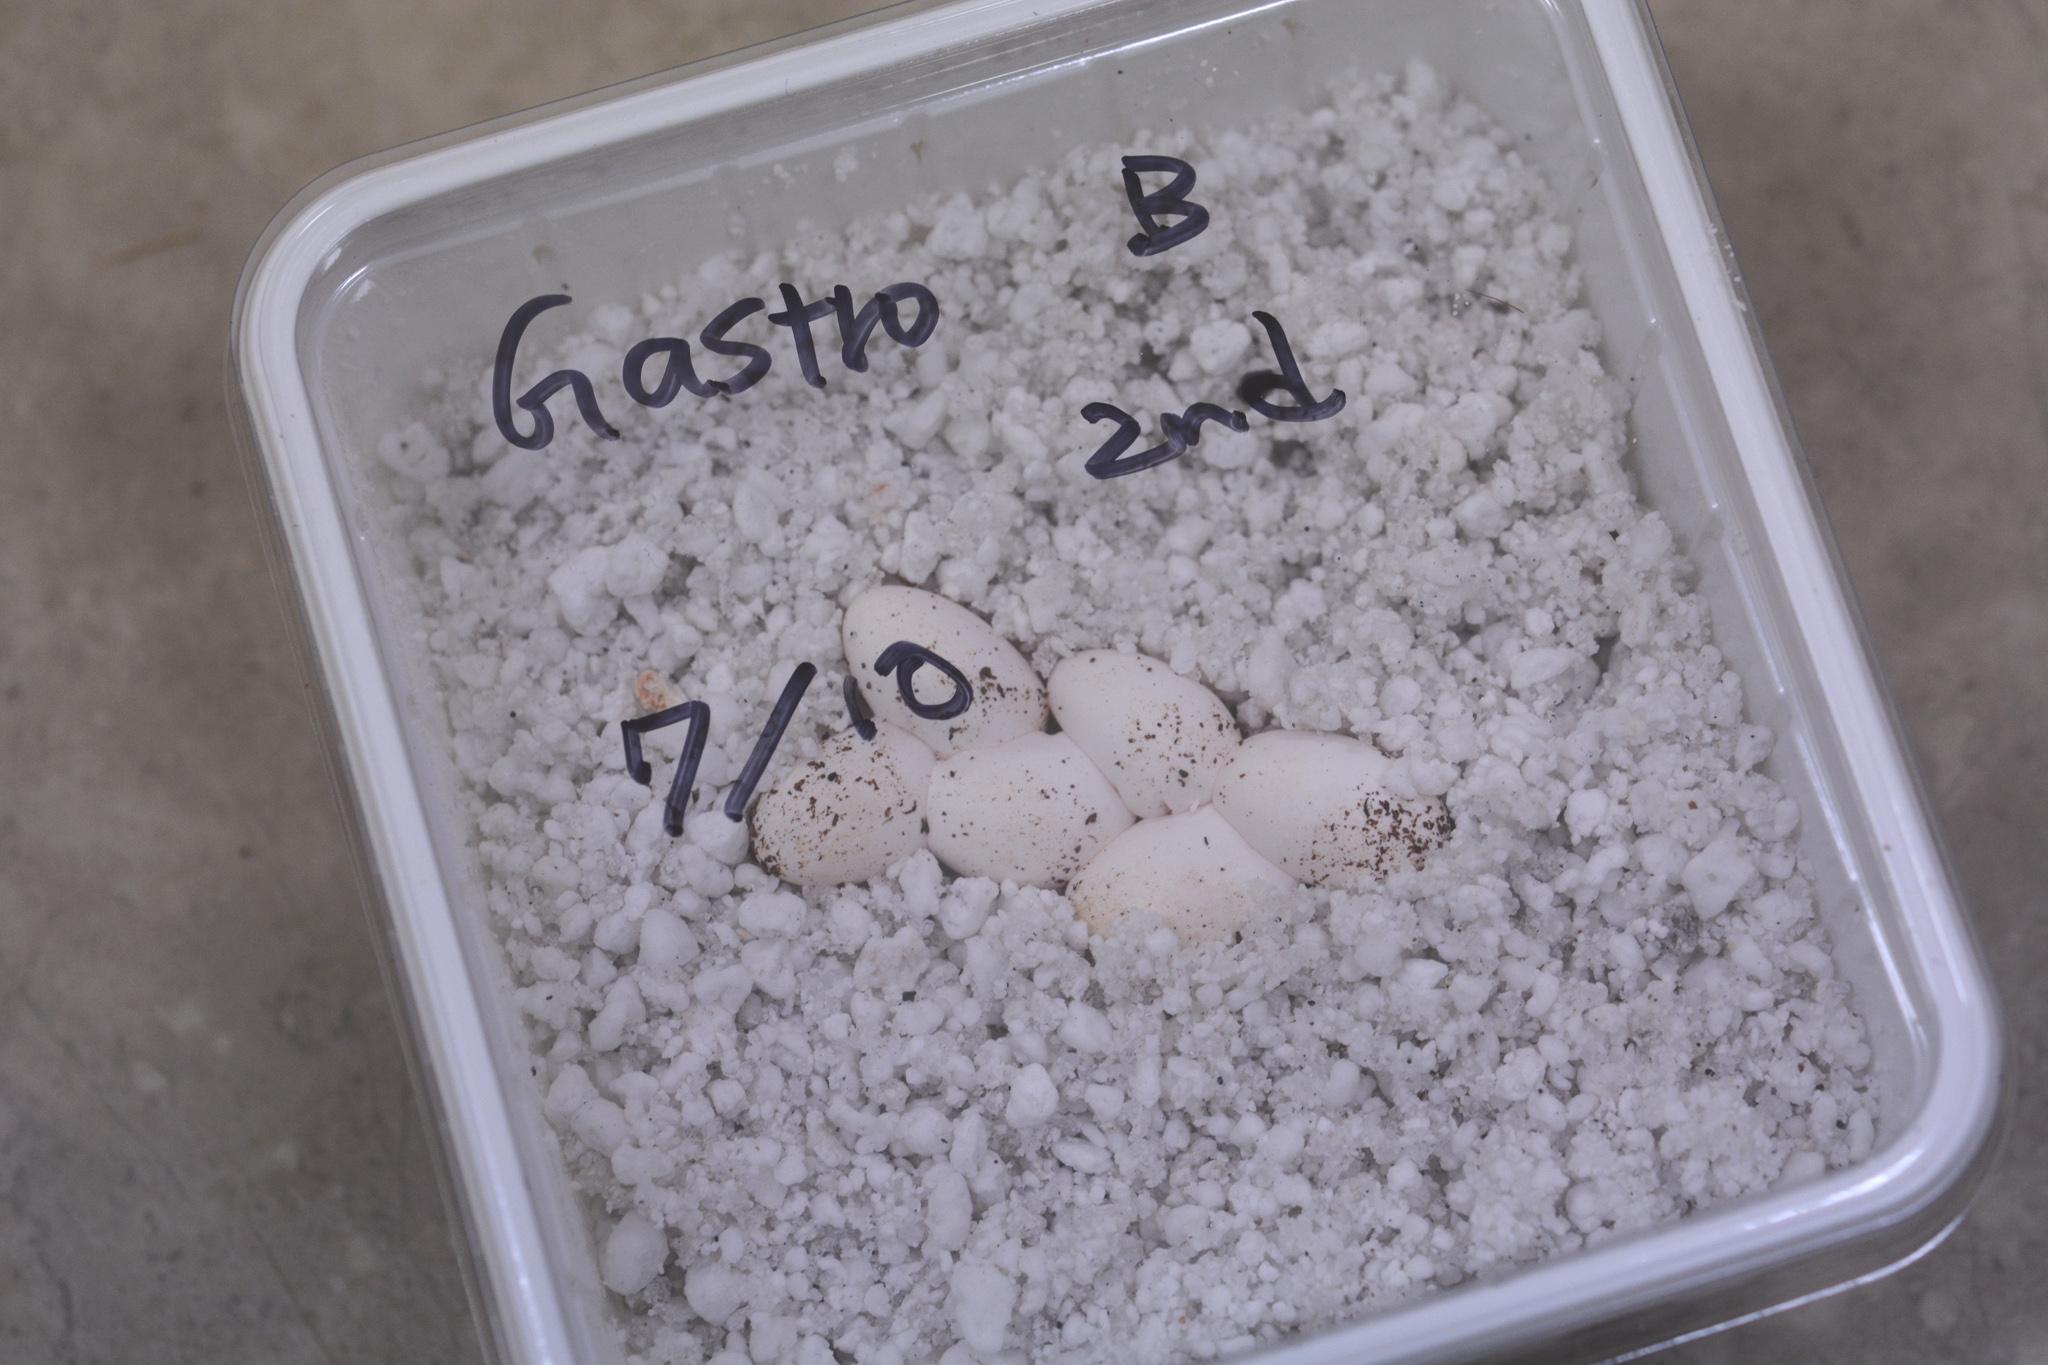 gastropholisprasina_eggs02.jpg